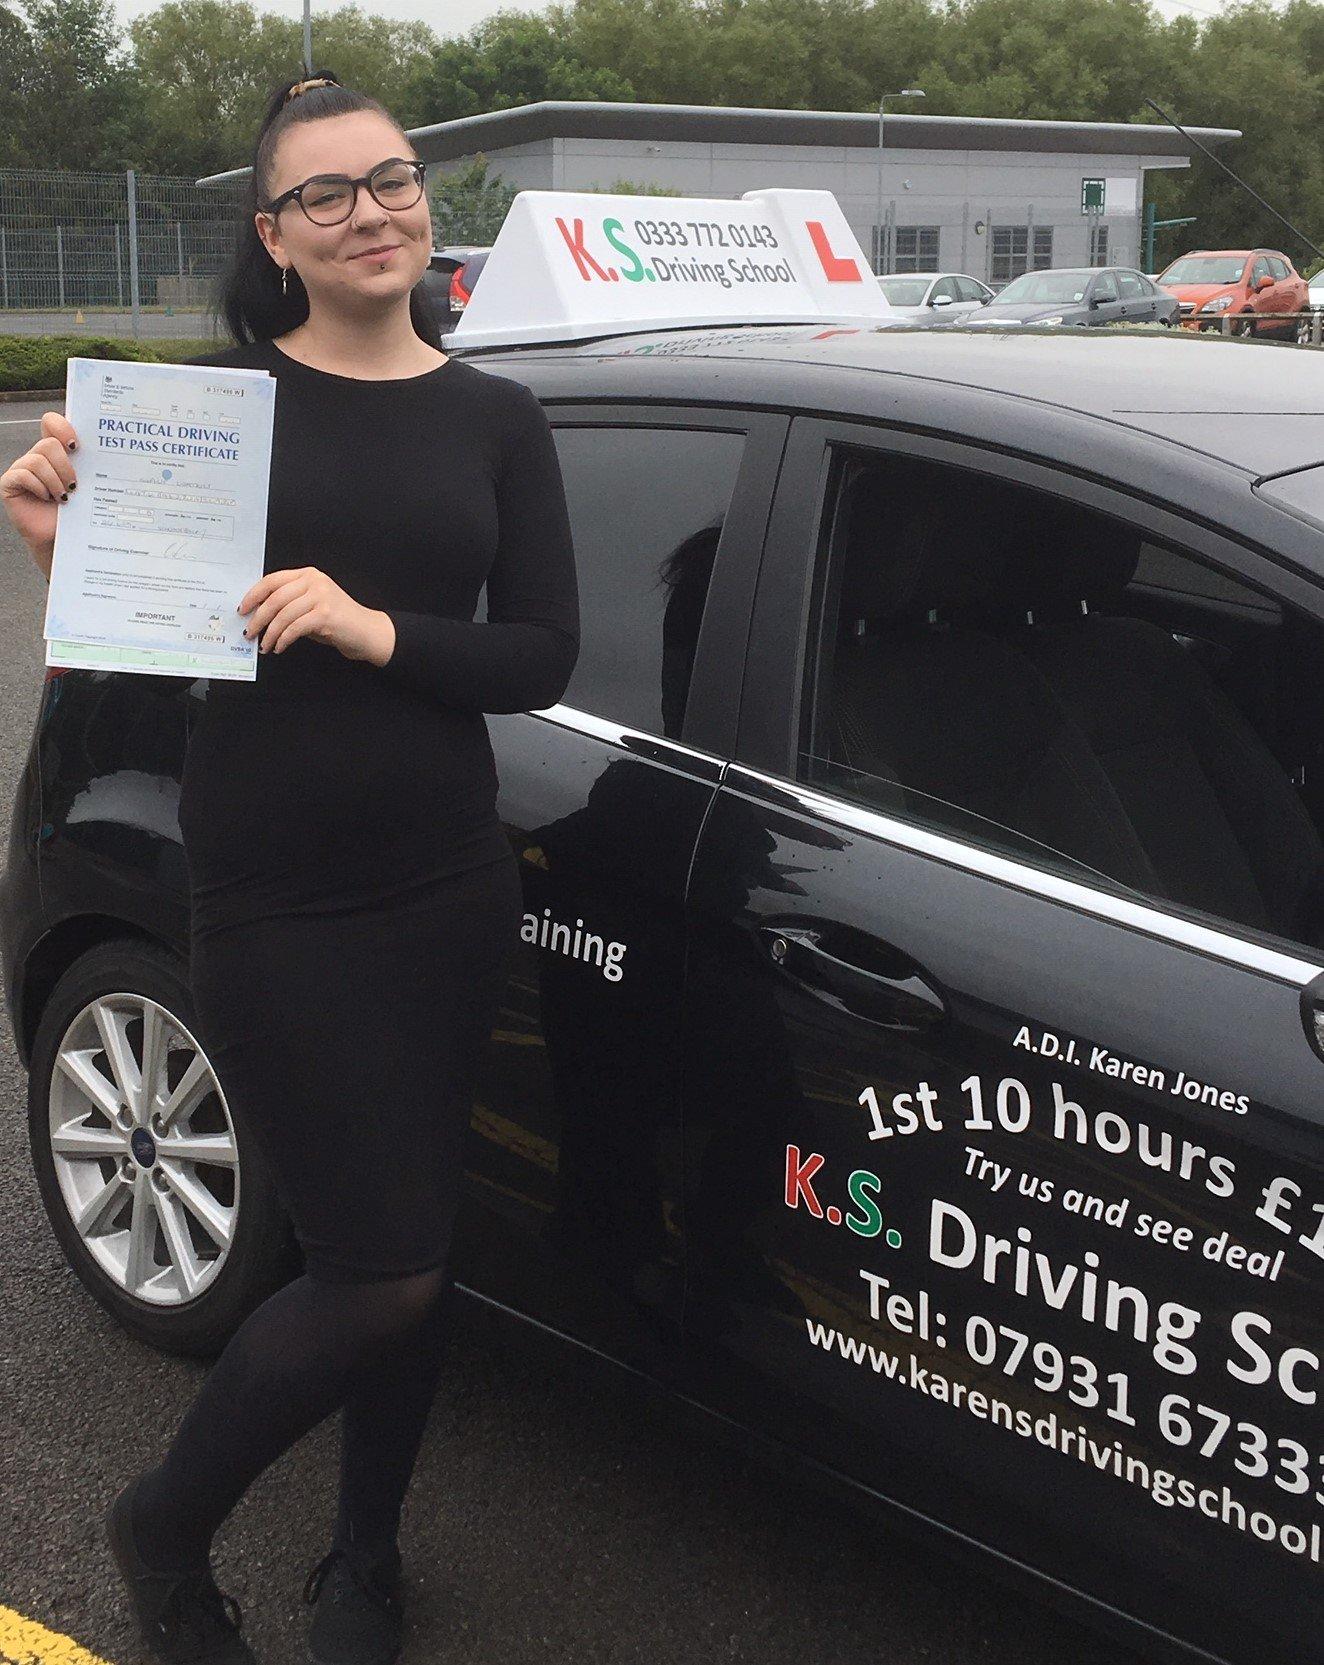 Driving Lessons Shrewsbury 26th June